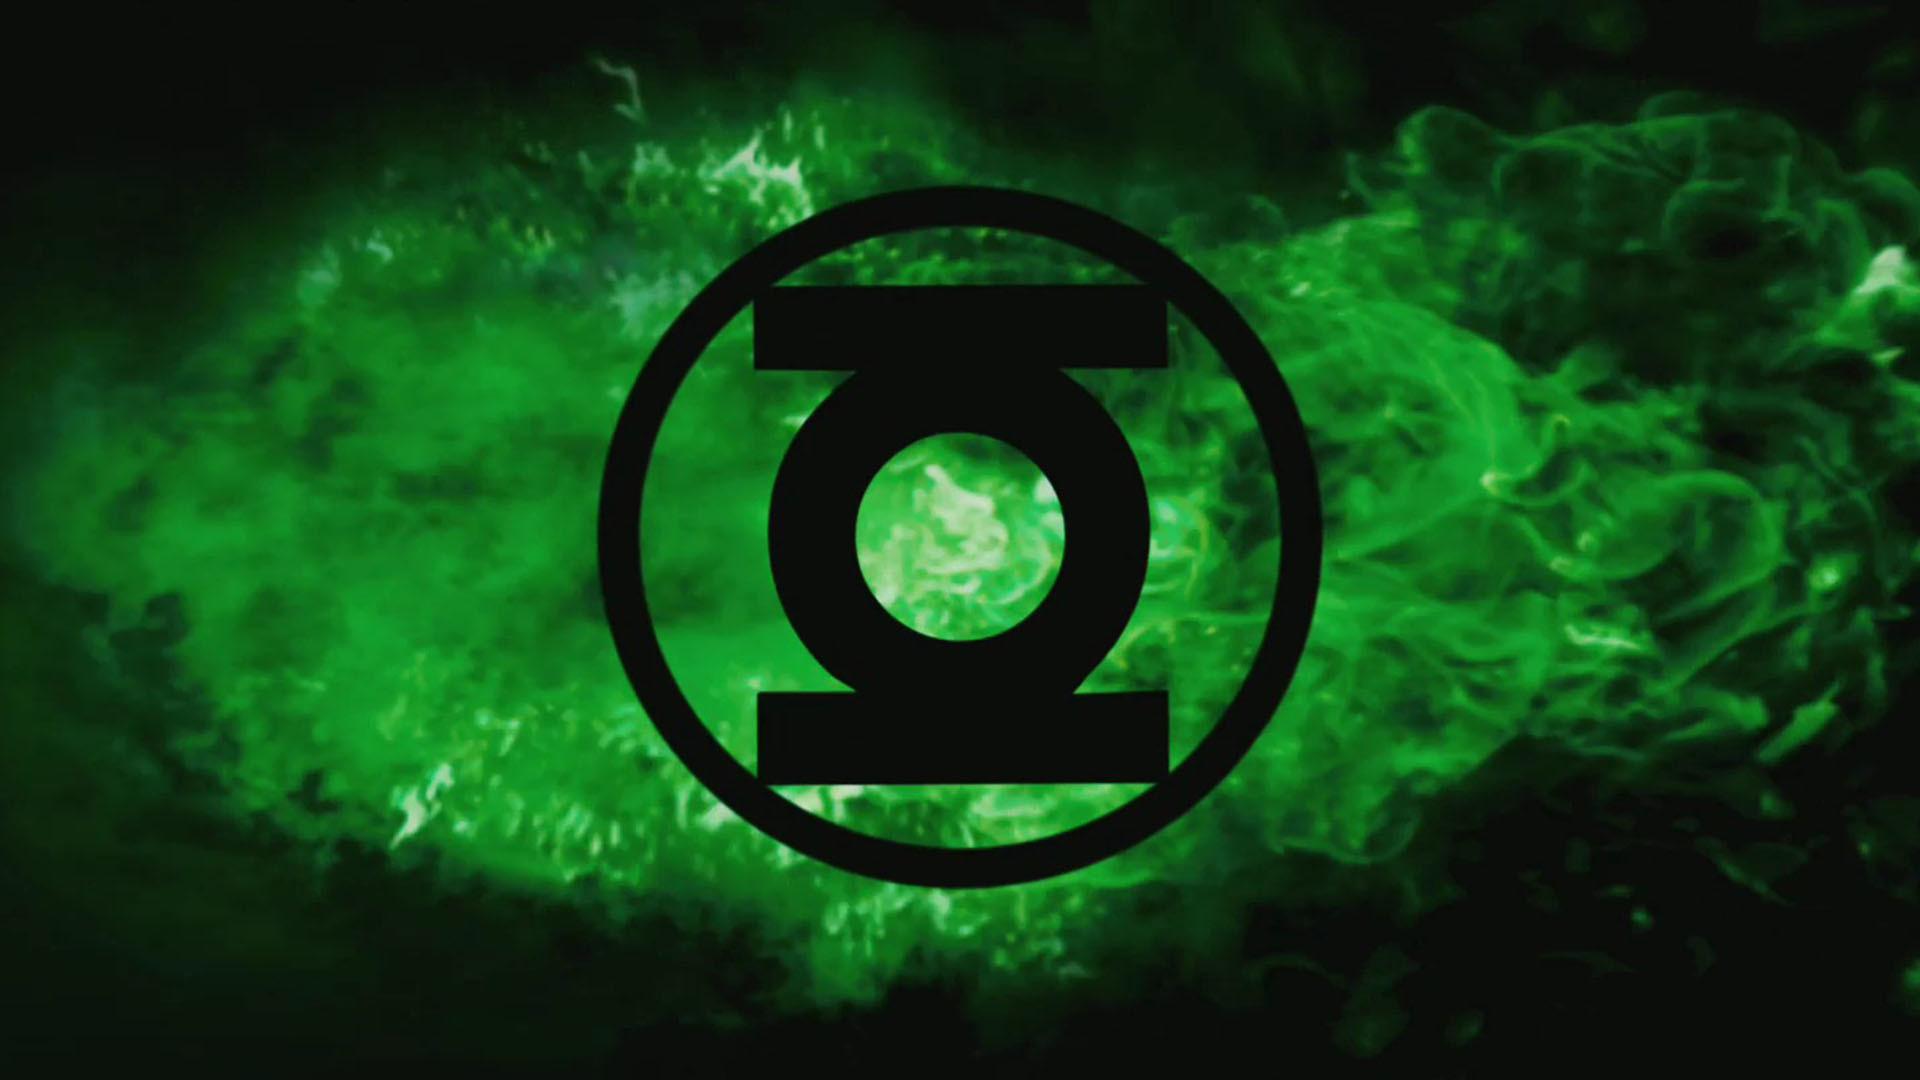 Green Lantern TheWallpapers | Free Desktop Wallpapers for HD .